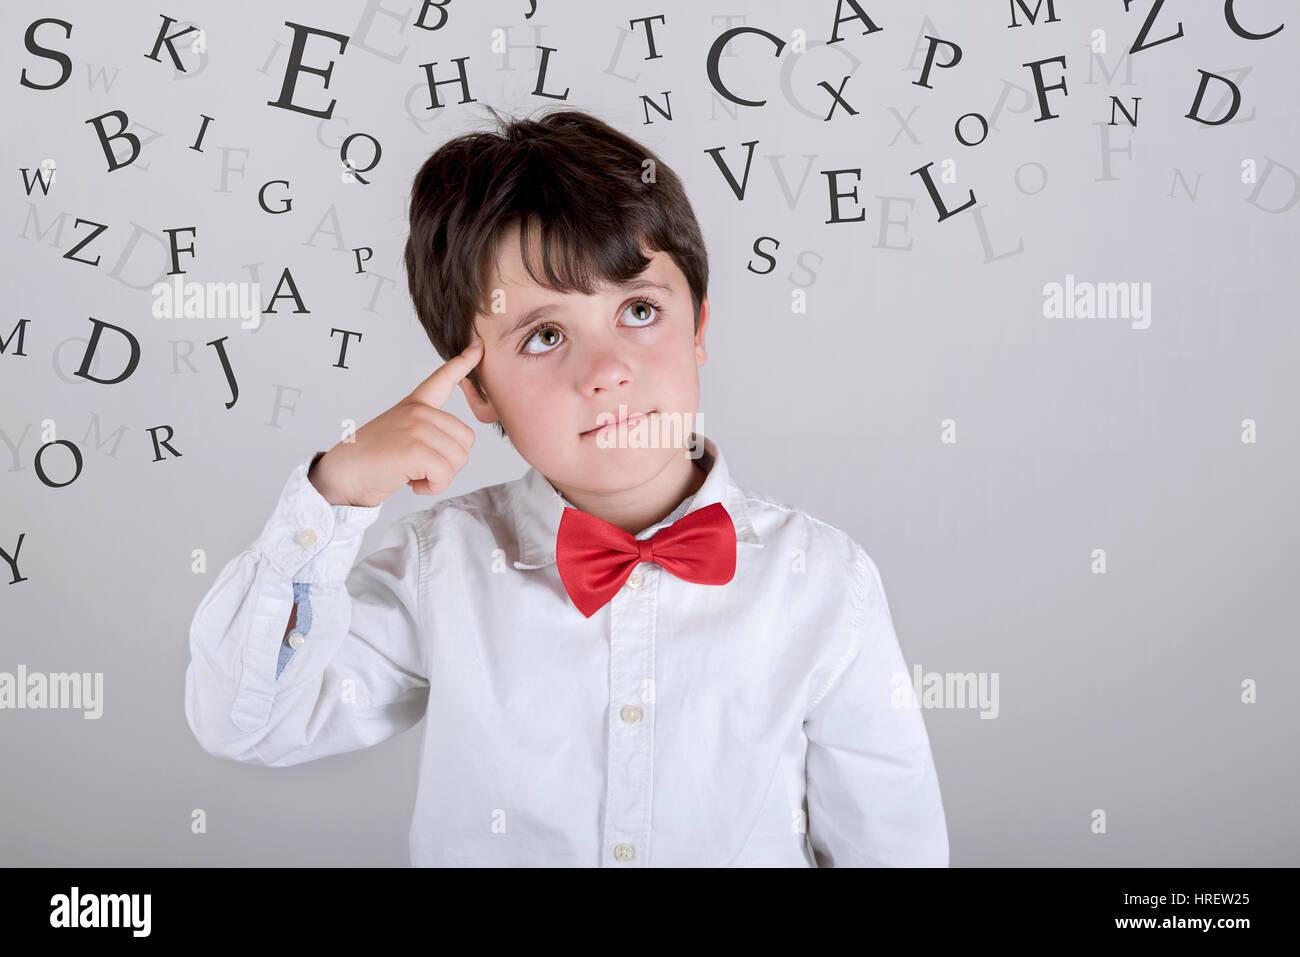 Alphabet. Composite image of thoughtful boy - Stock Image